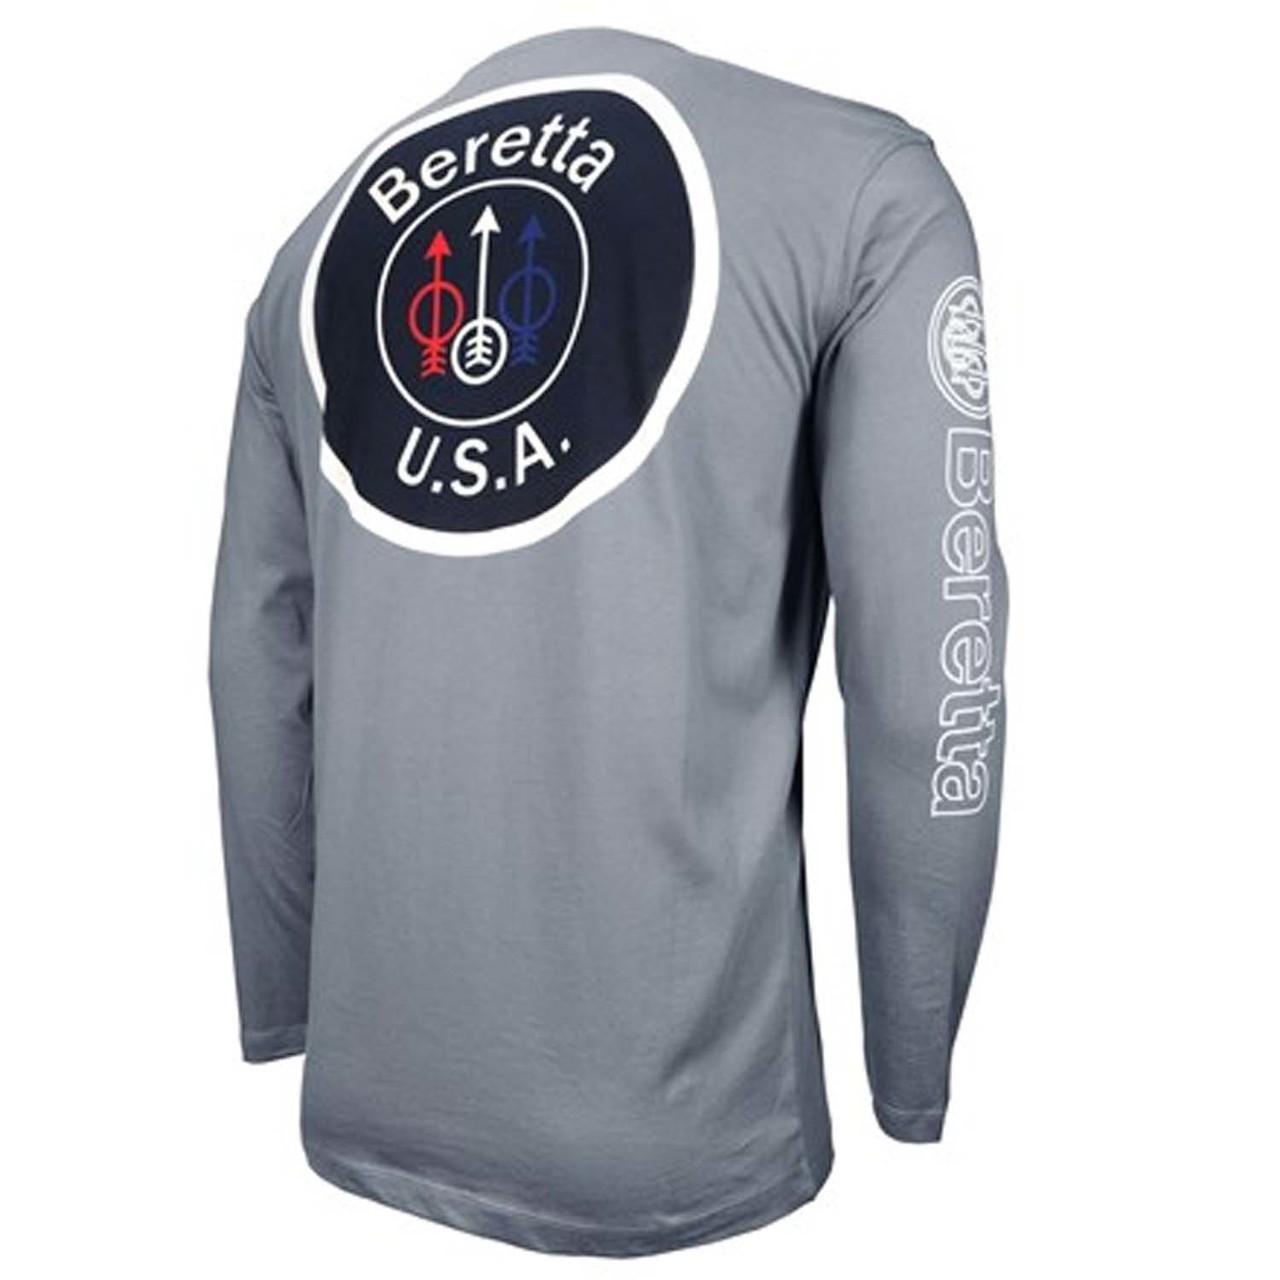 9e91b303c Beretta USA Logo Long Sleeve T-Shirt-Gray - NICASHOOTING. COM